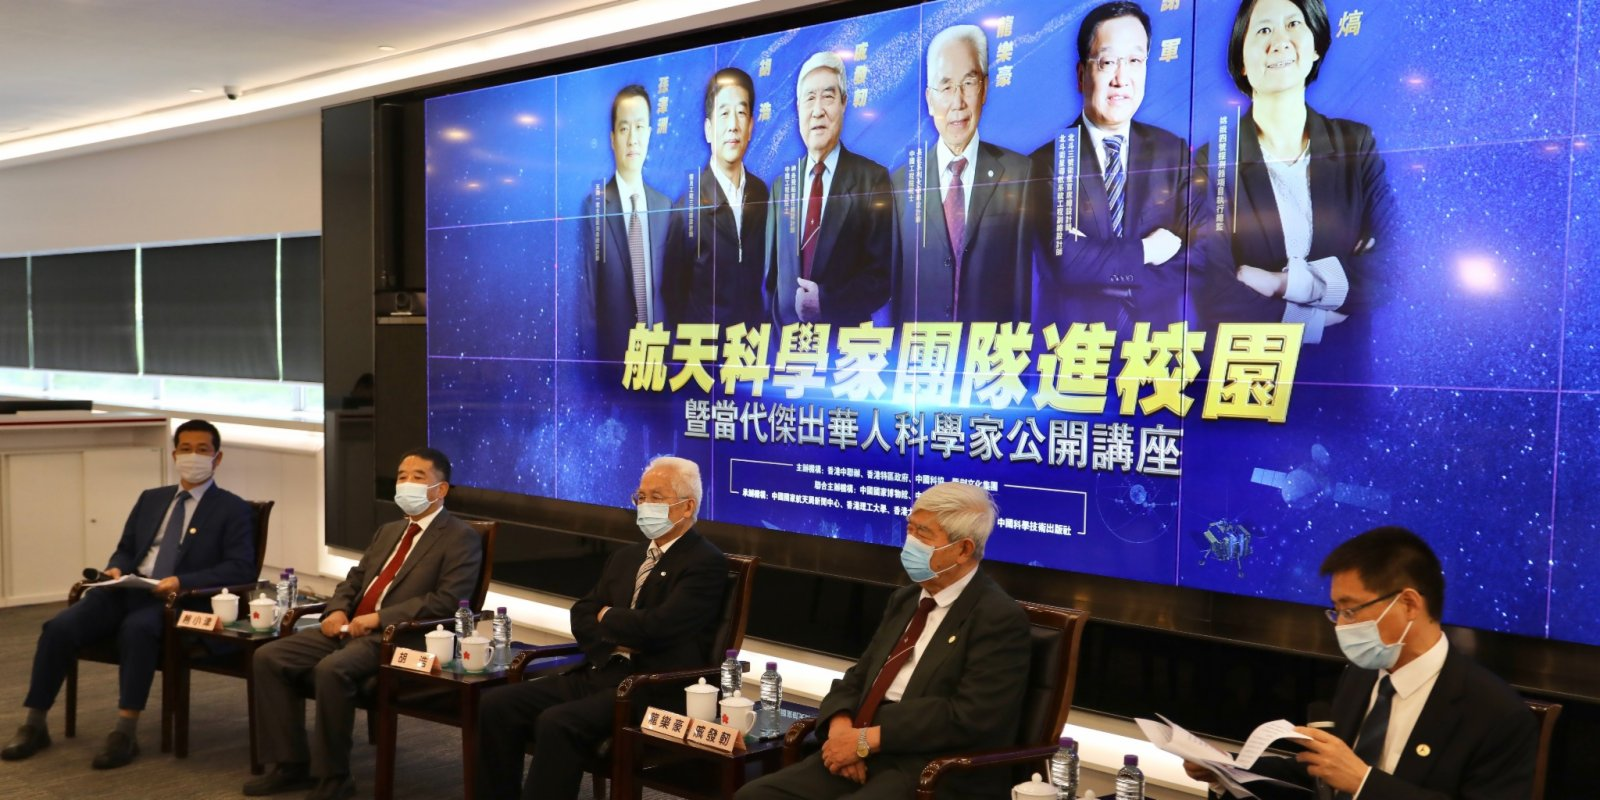 National space authority to establish regular exchange mechanism with HK